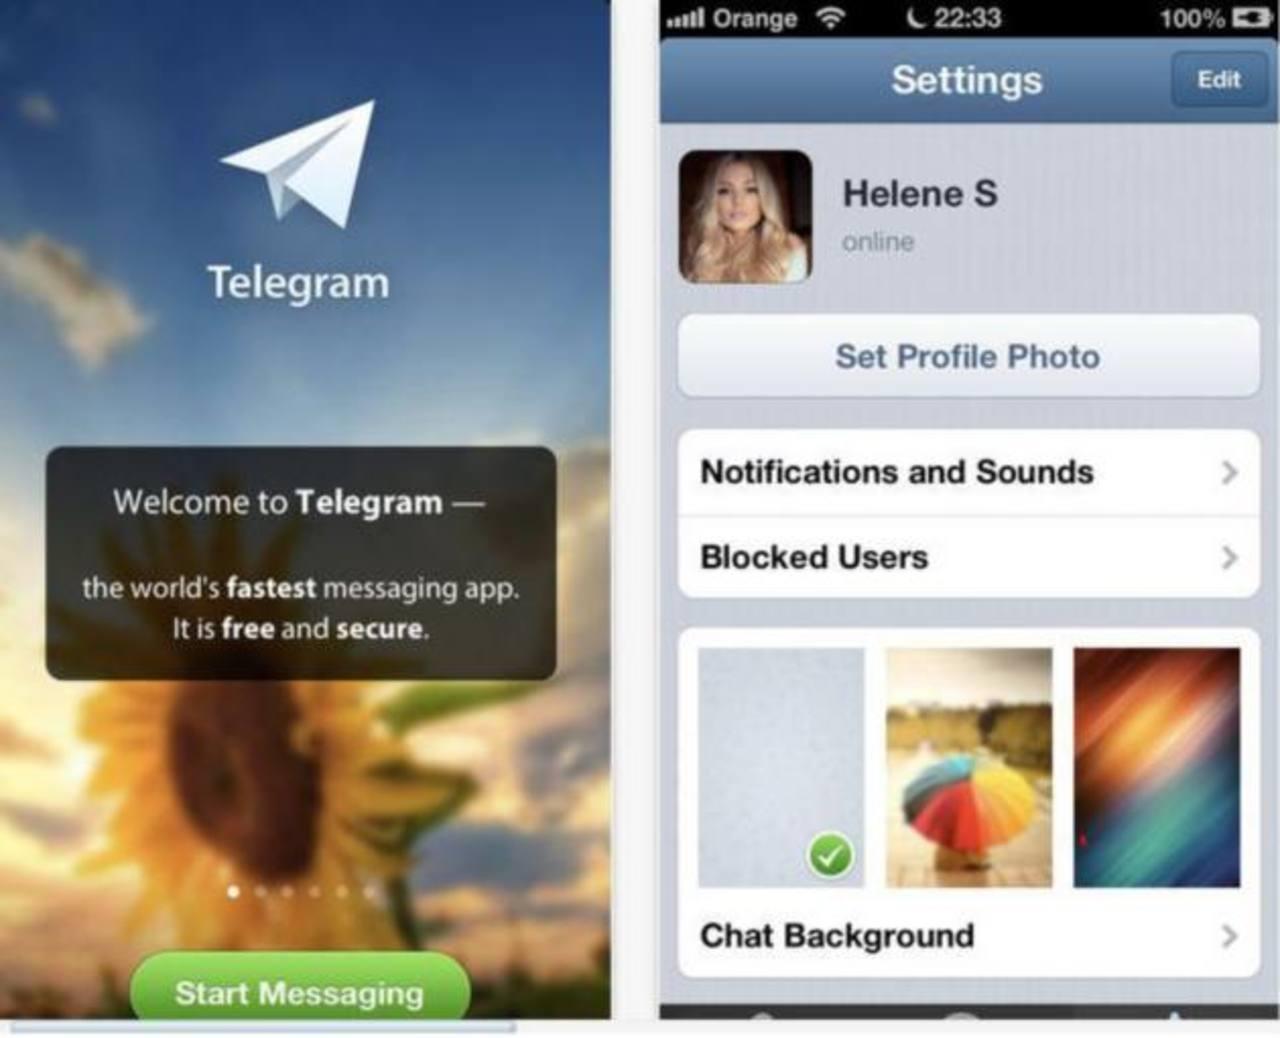 La aplicación Telegram busca competir con WhatsApp